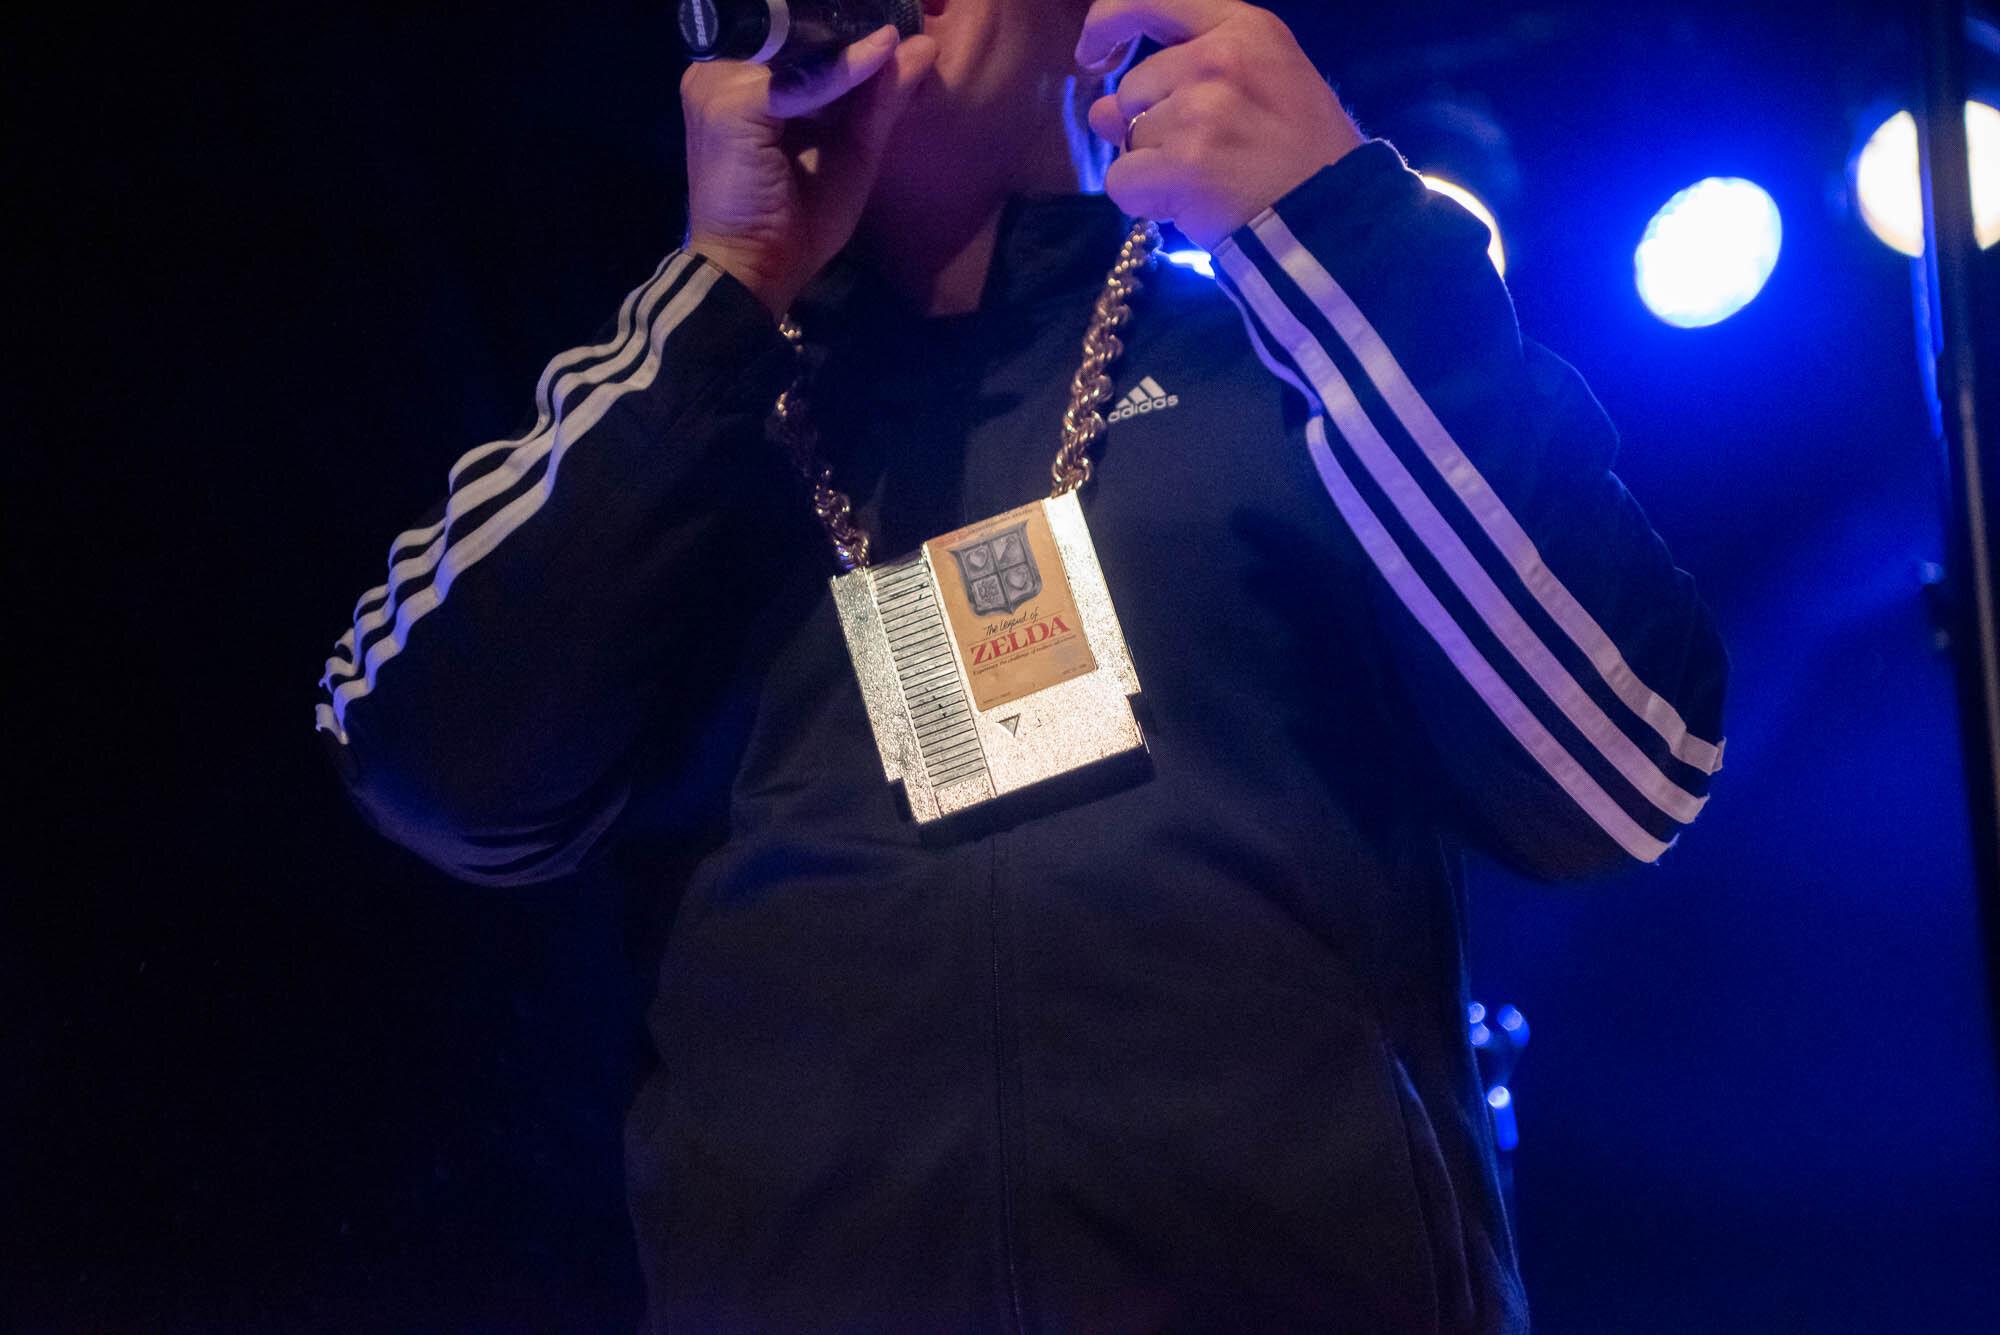 MC Lars performing at Warsaw in Brooklyn, NY on Friday, September 20, 2019.